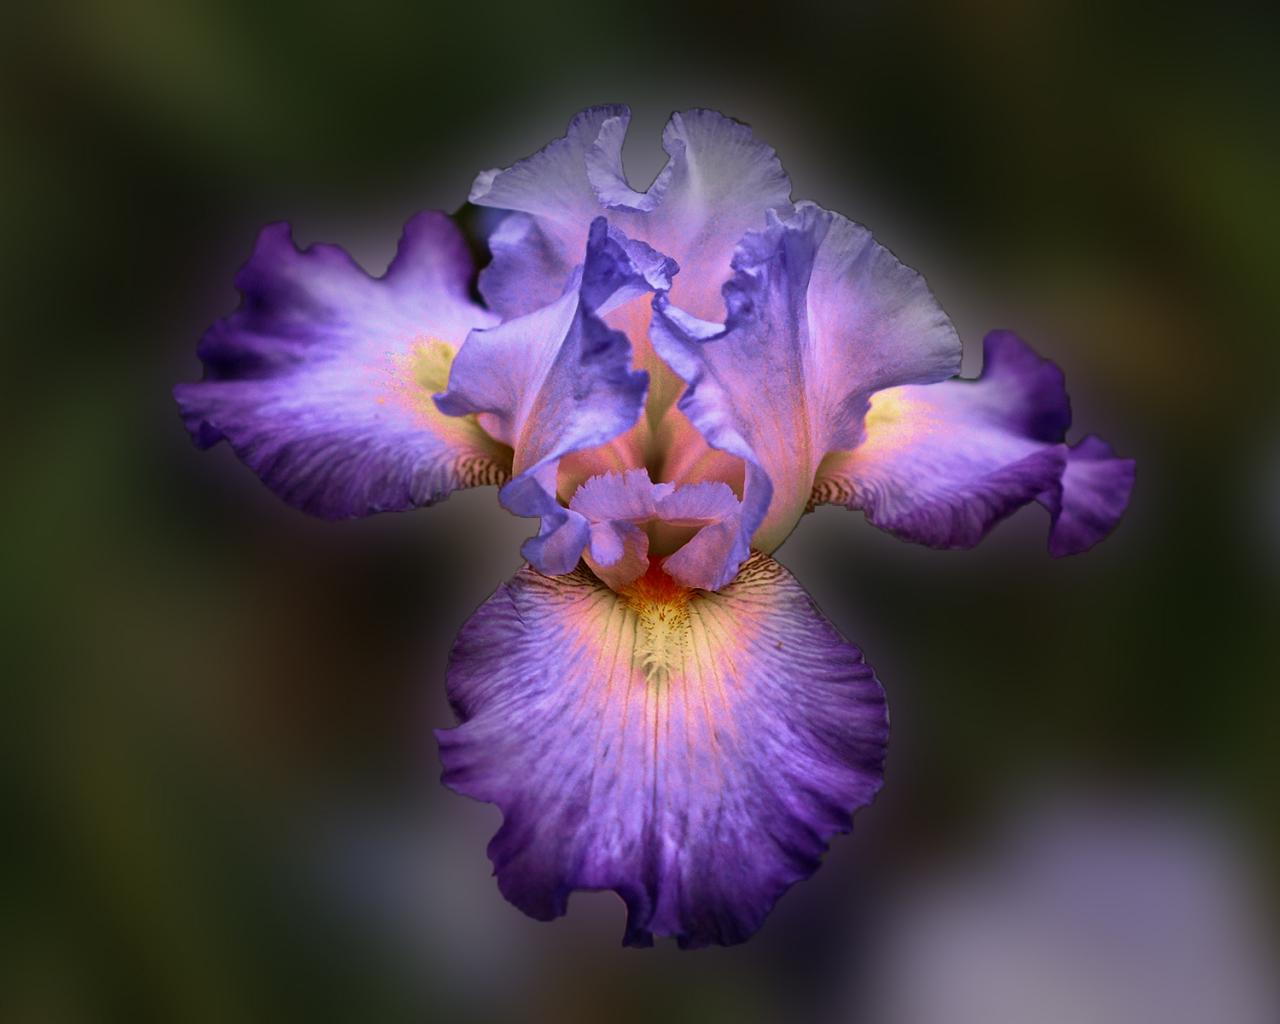 Bella flor purpura - 1280x1024